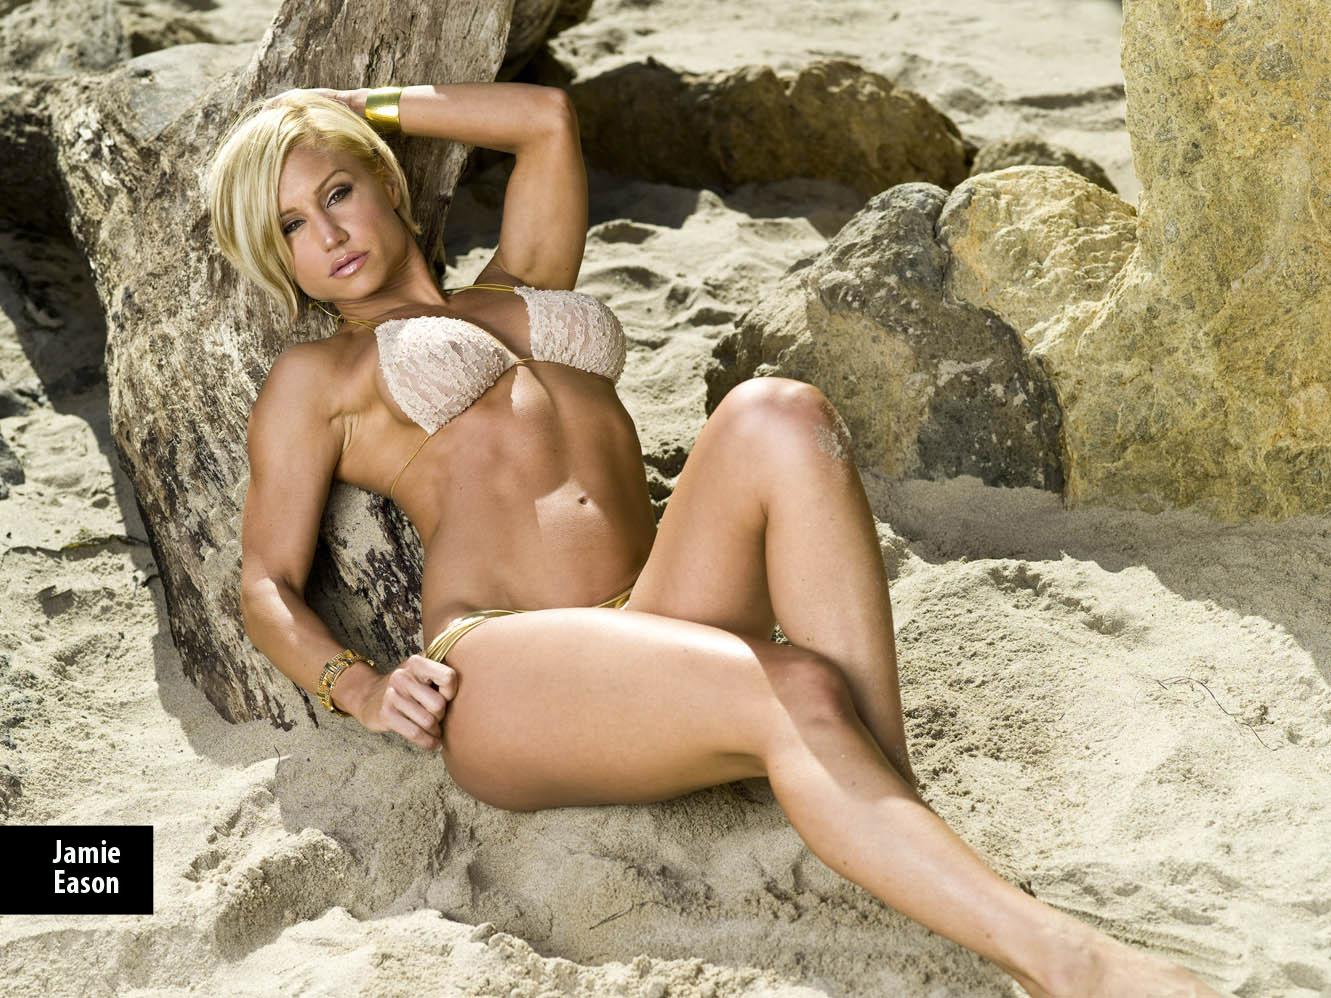 Wish jamie eason nude